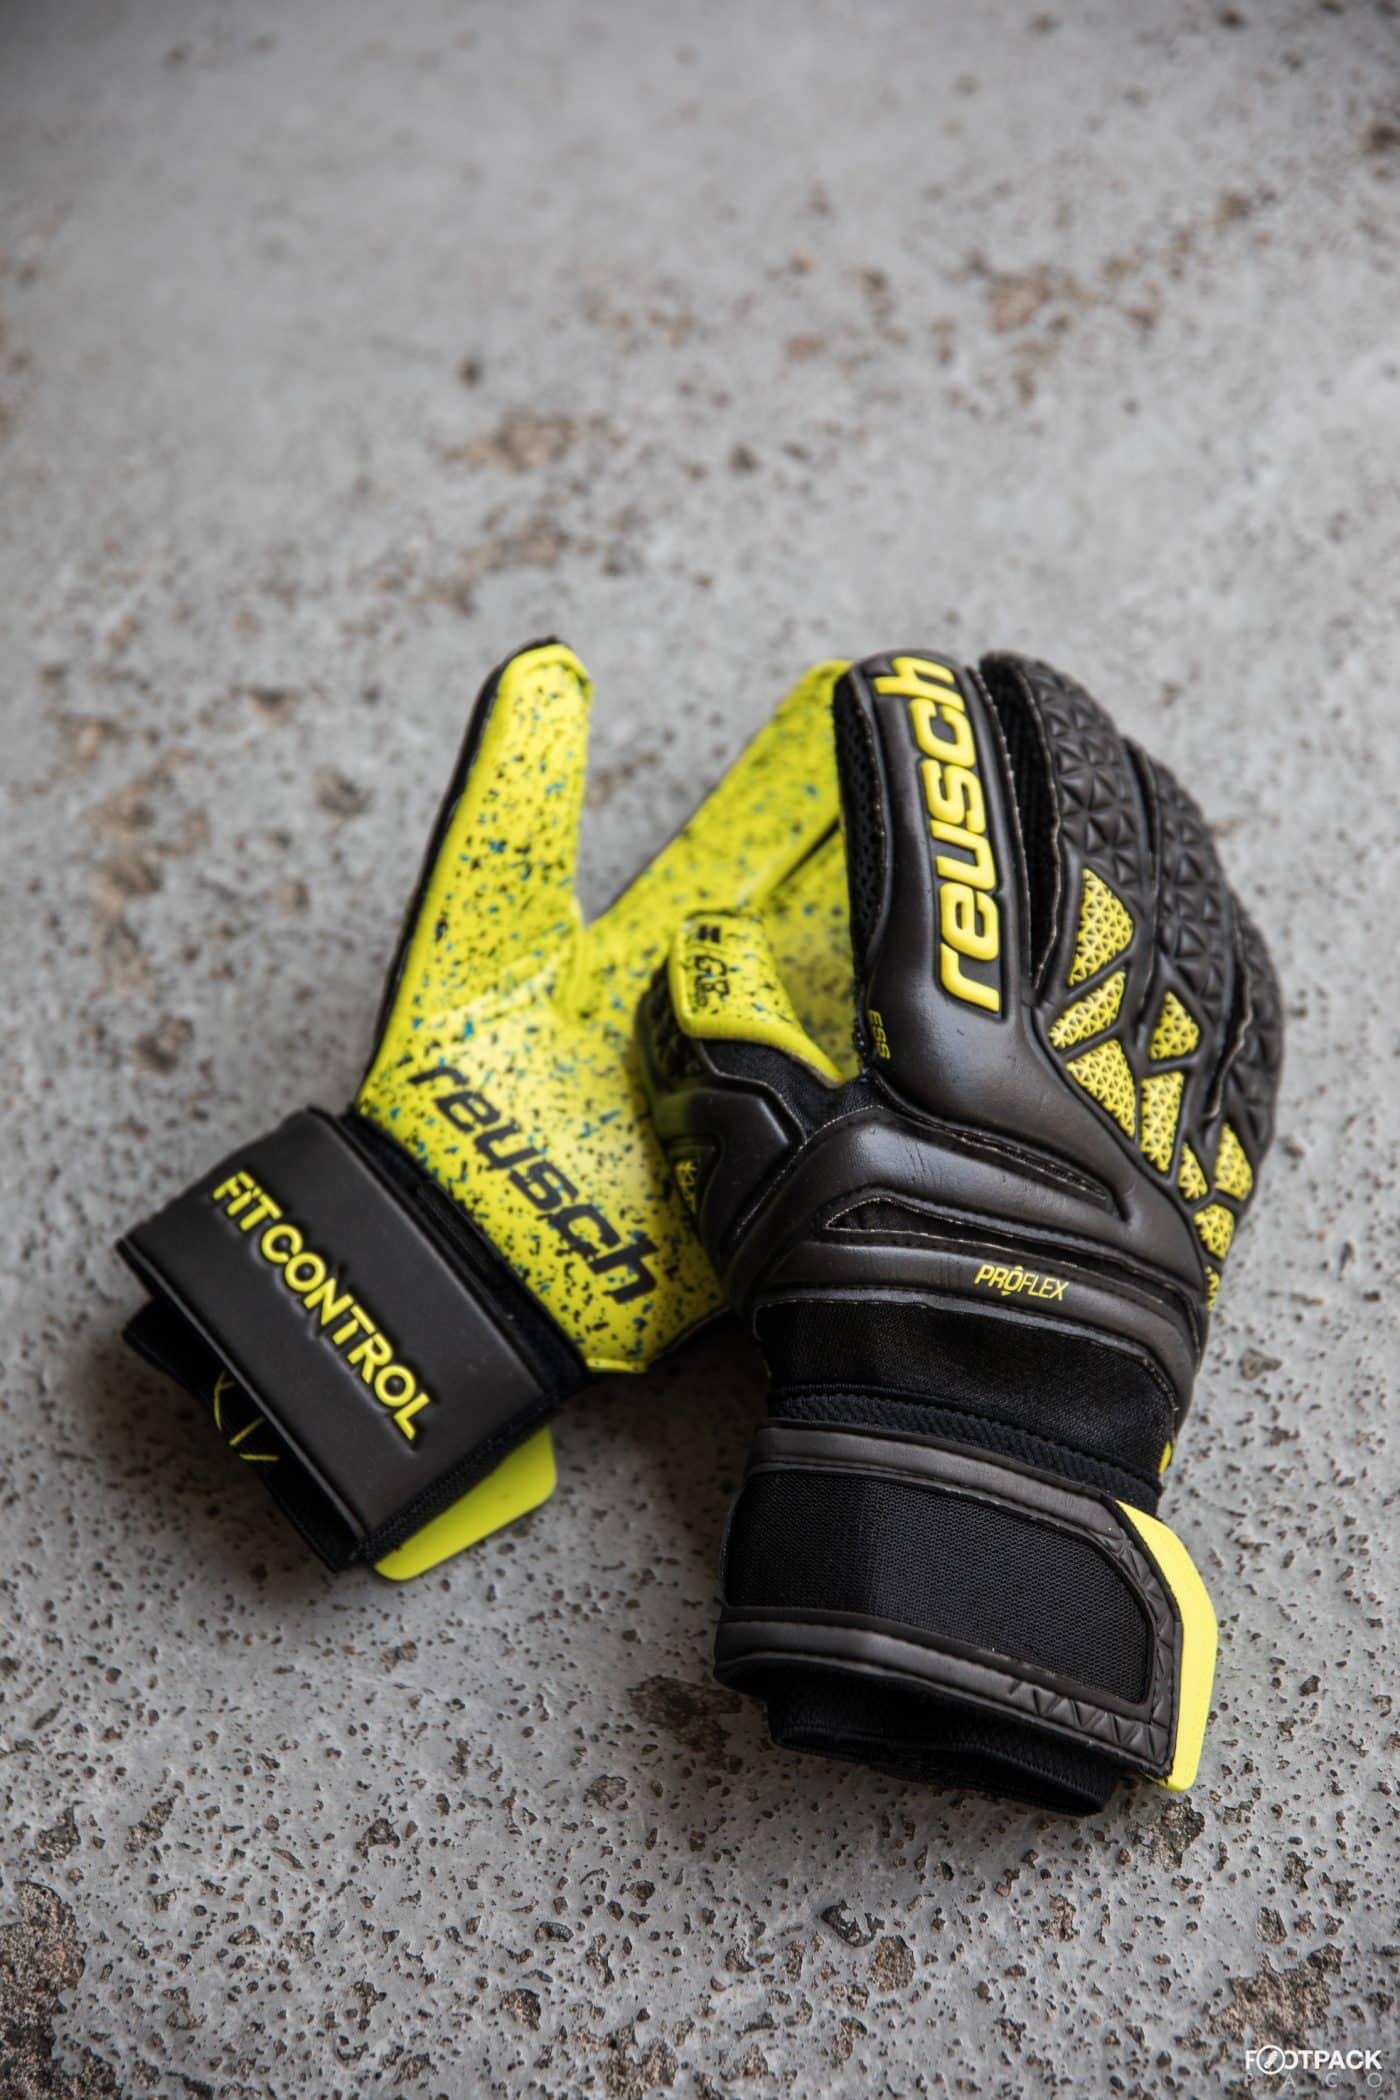 gant-reusch-fit-Control-Pro-G3-Fusion-HL-hugo-lloris-footpack-13